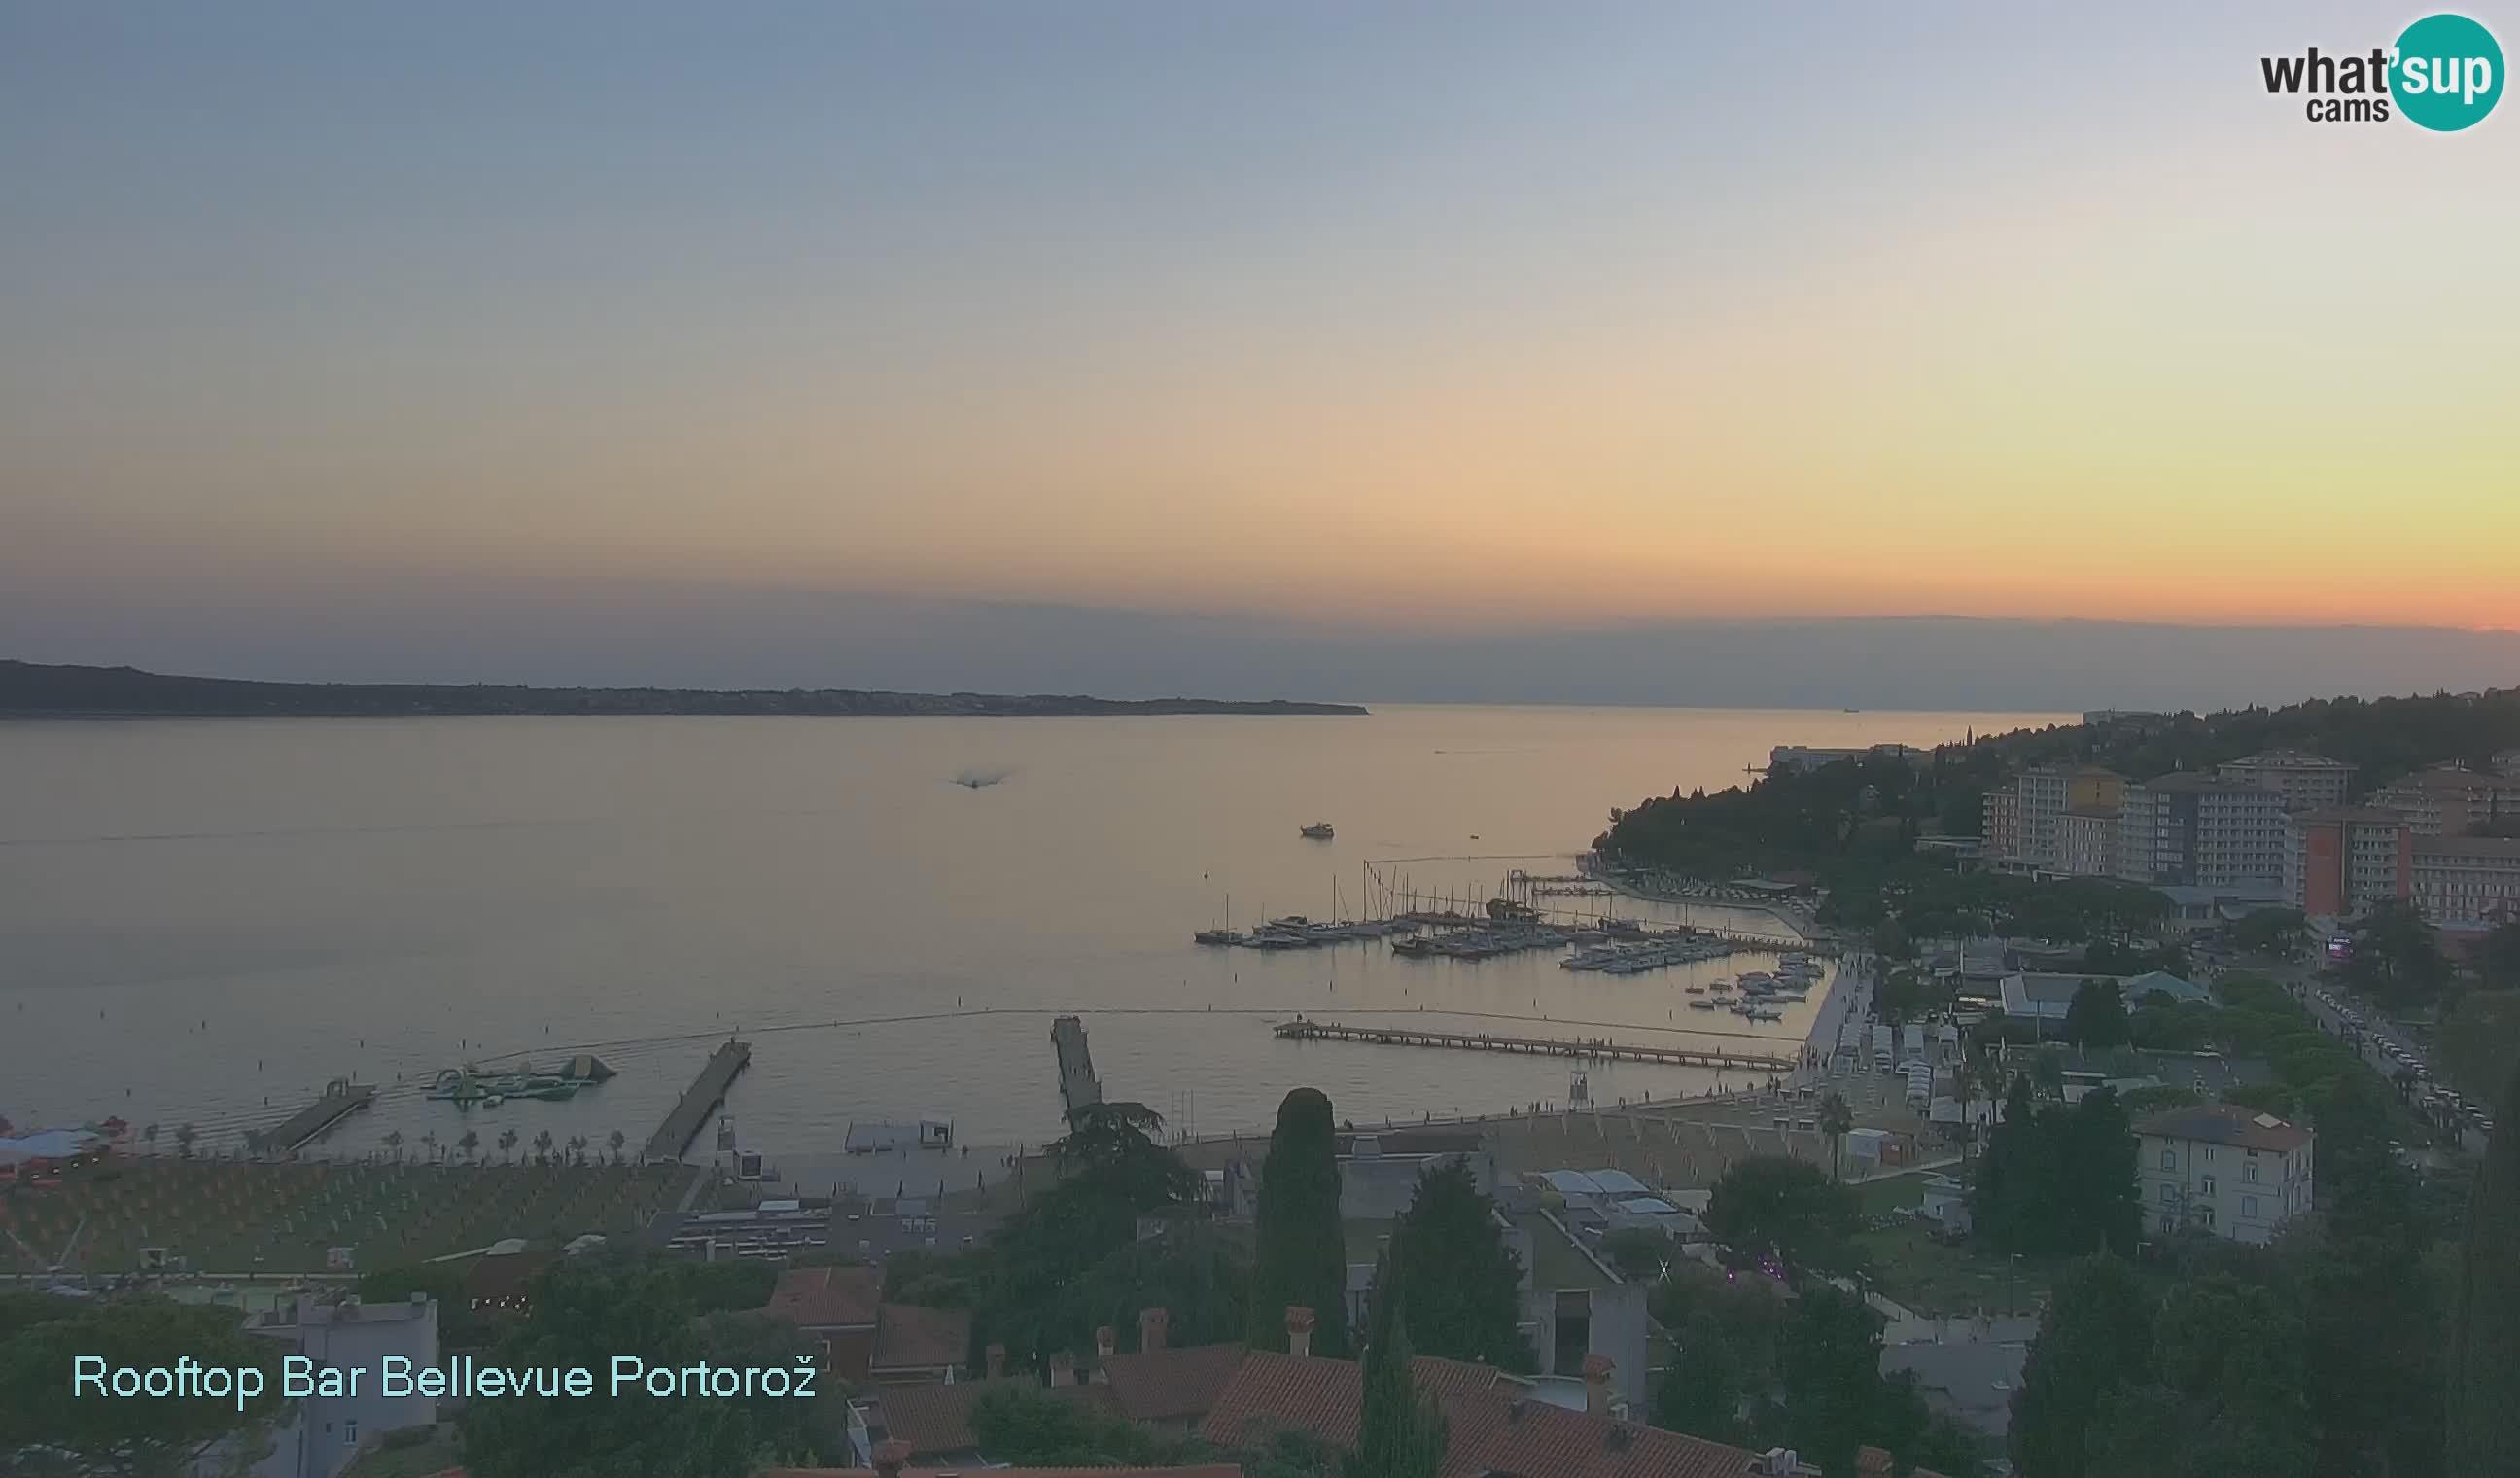 Portorož Sun. 20:35